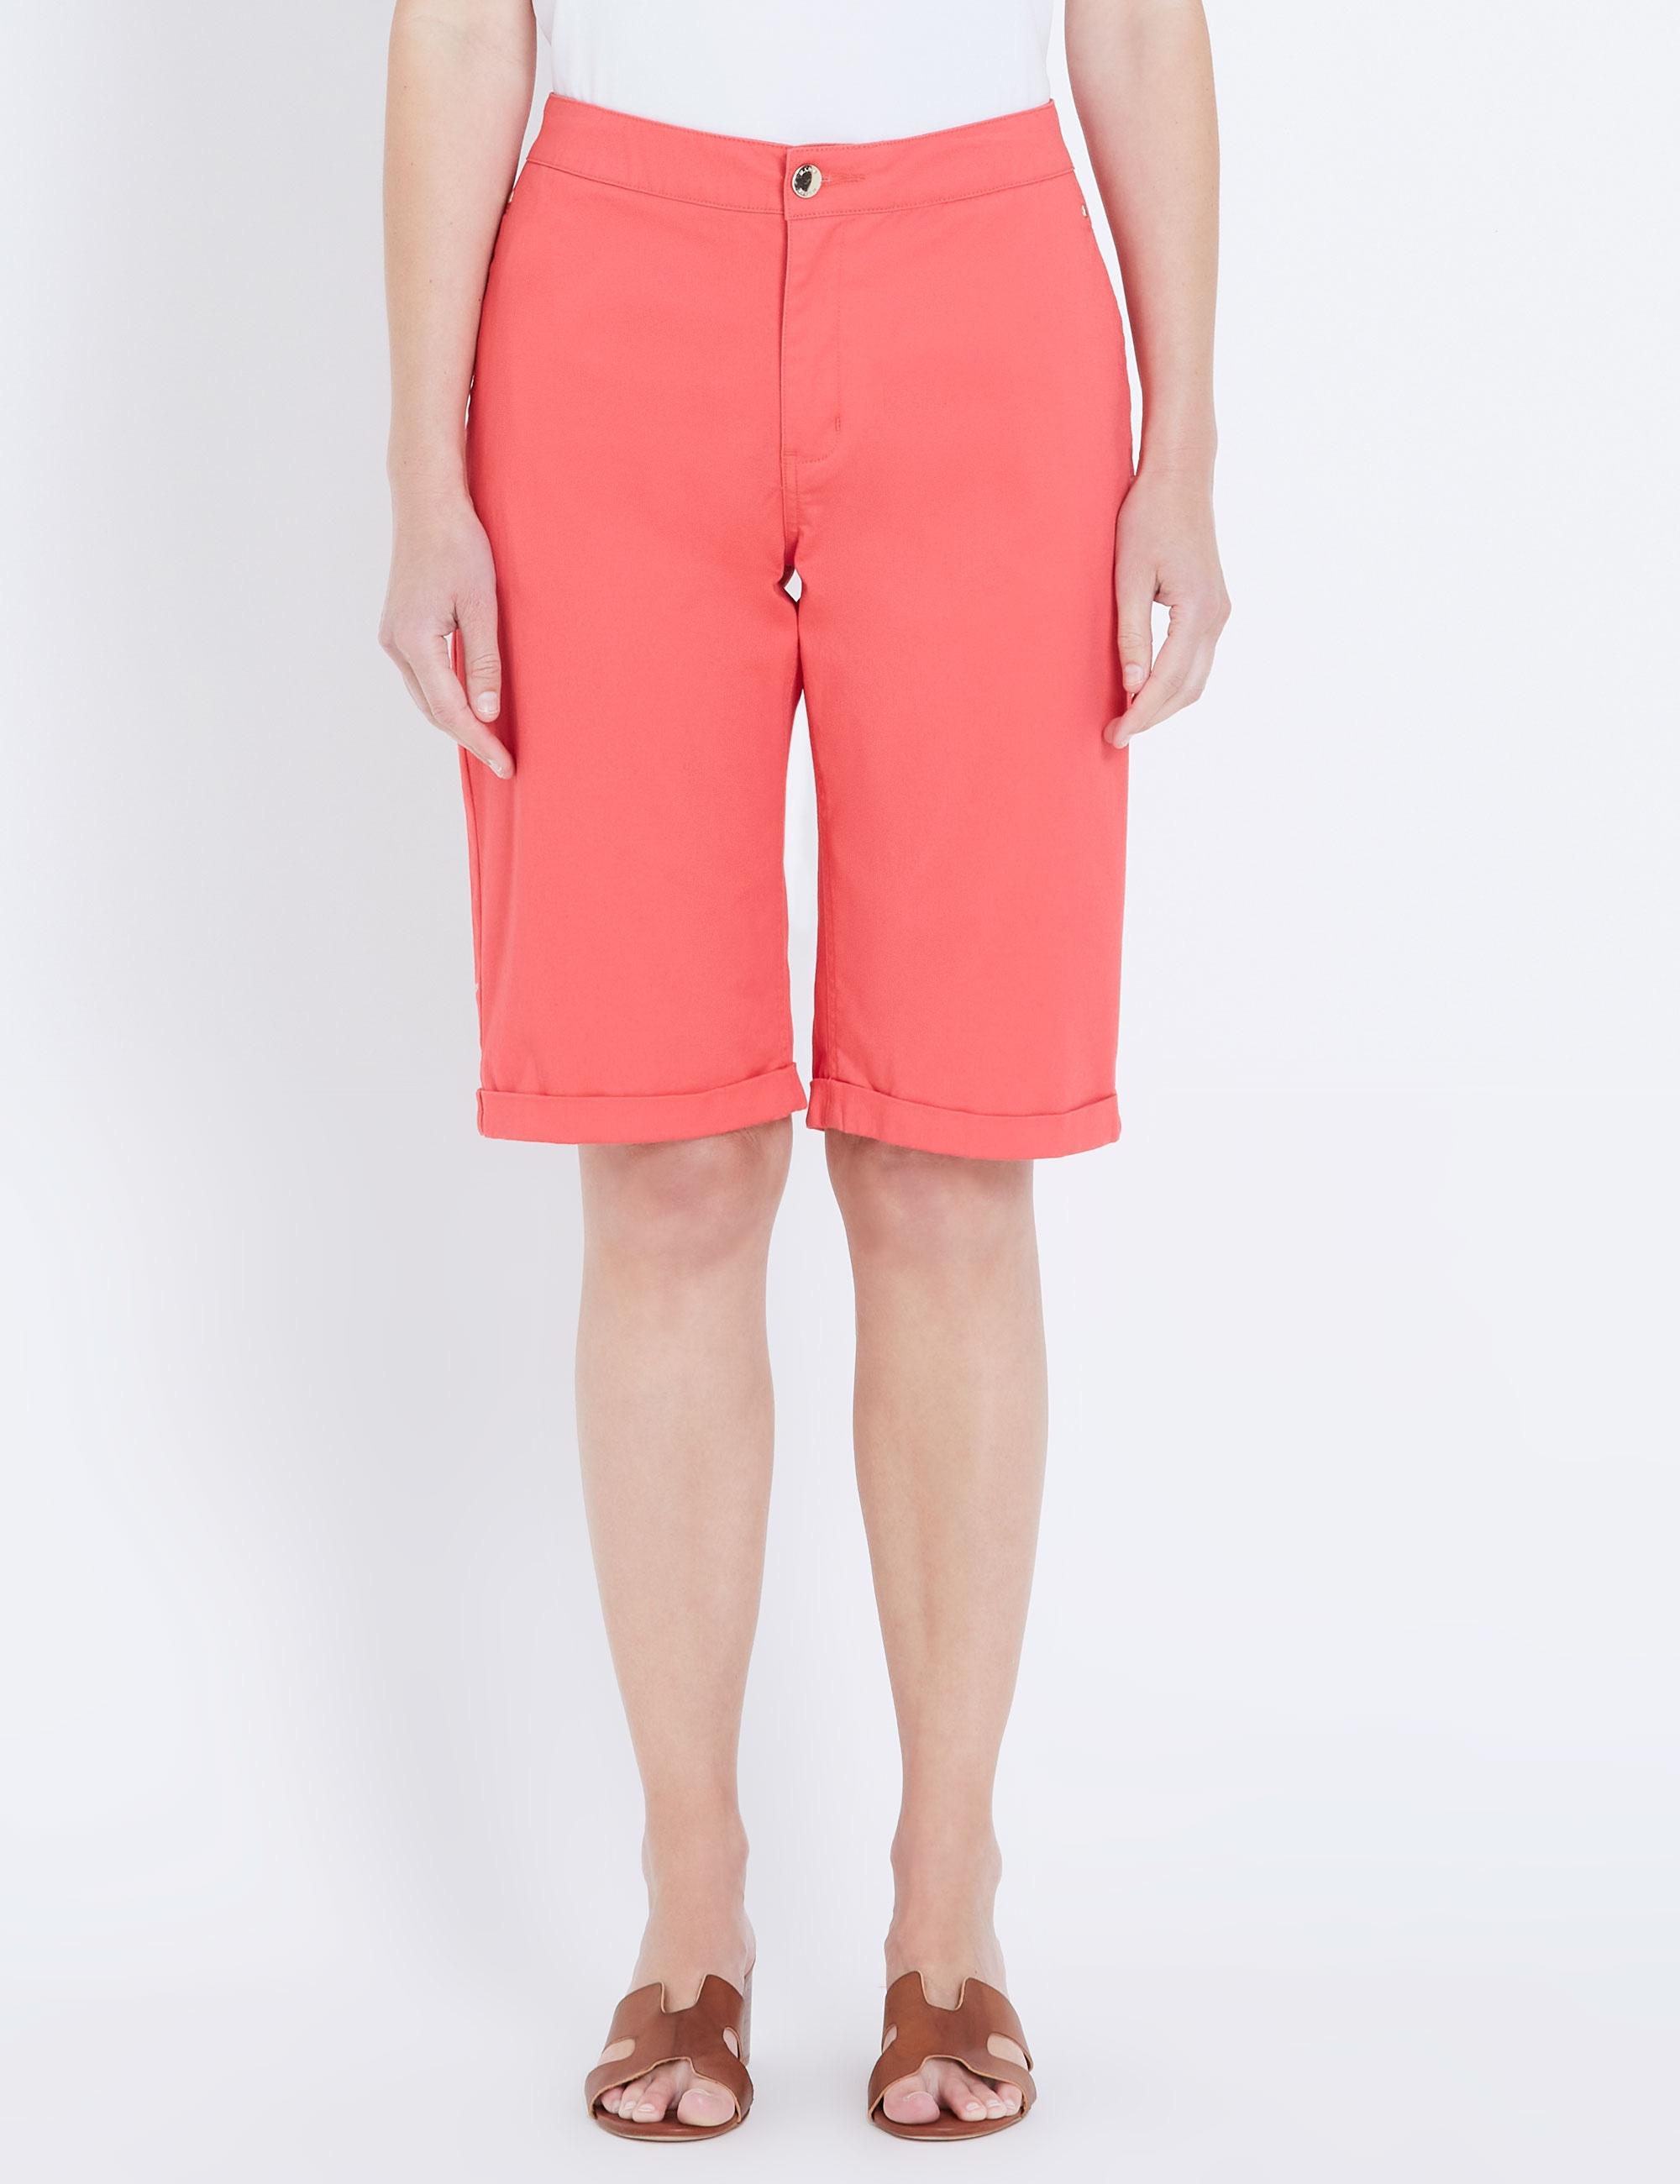 1051447650 1 - Women Fashion